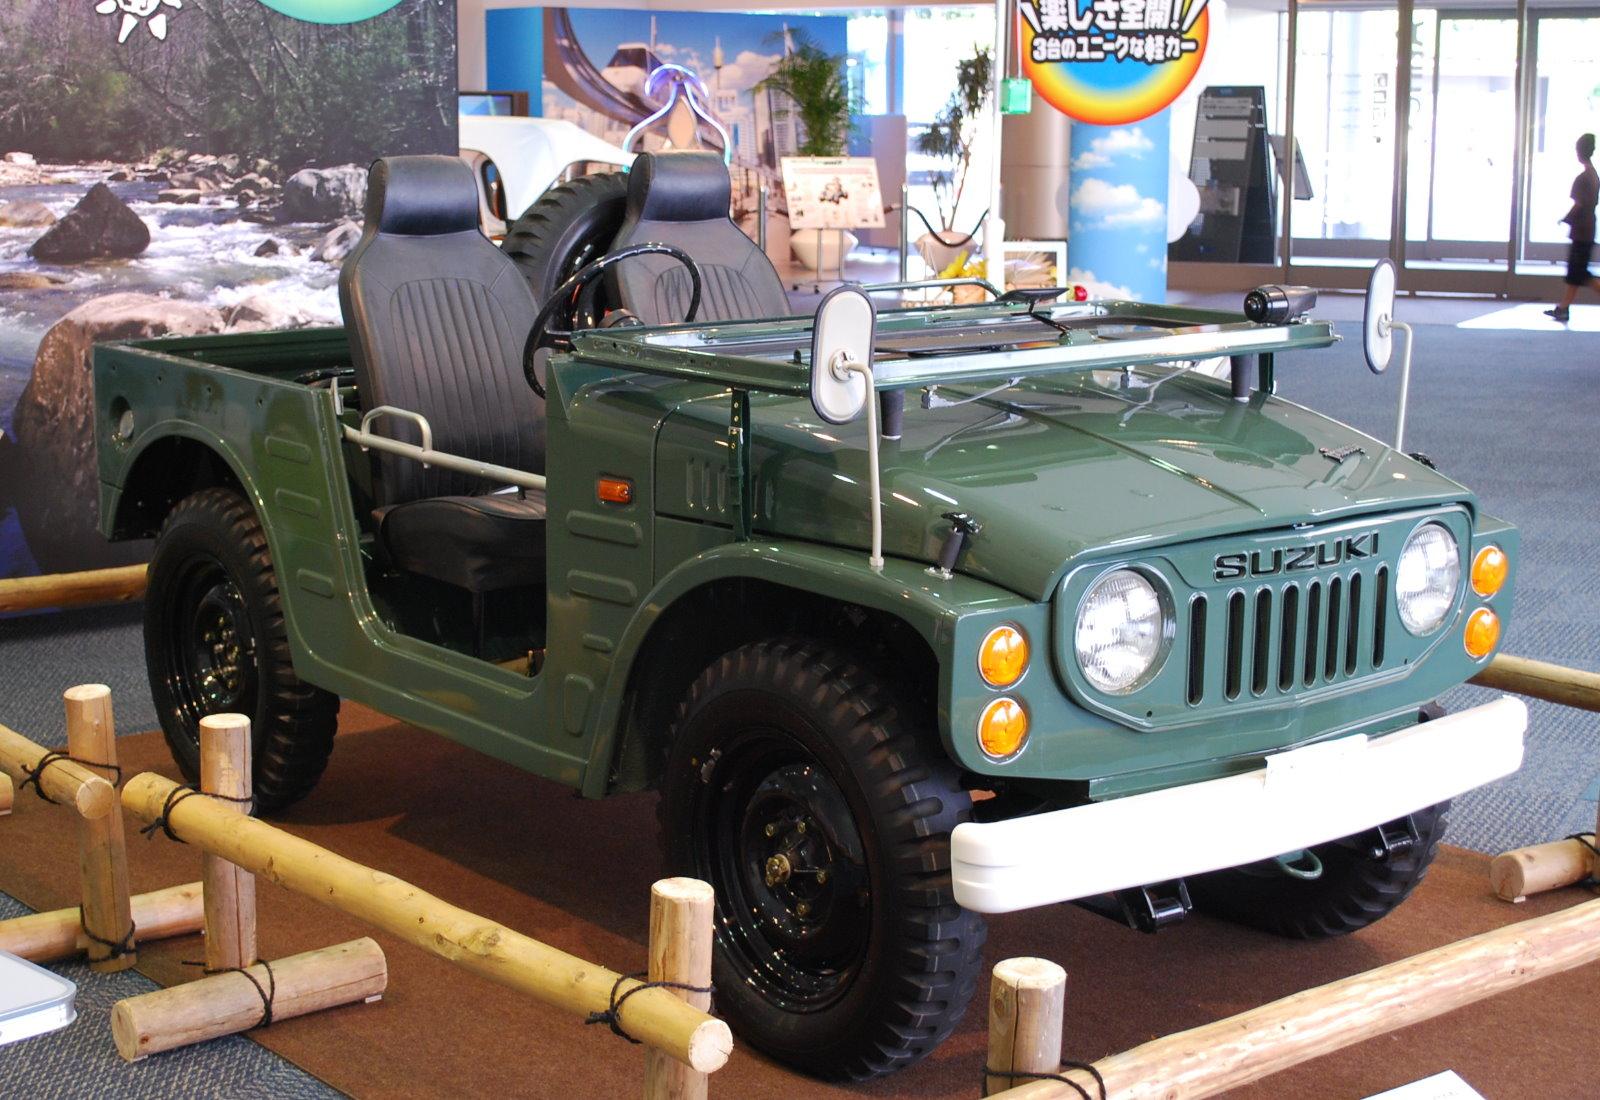 Suzuki Jimny Engine Size